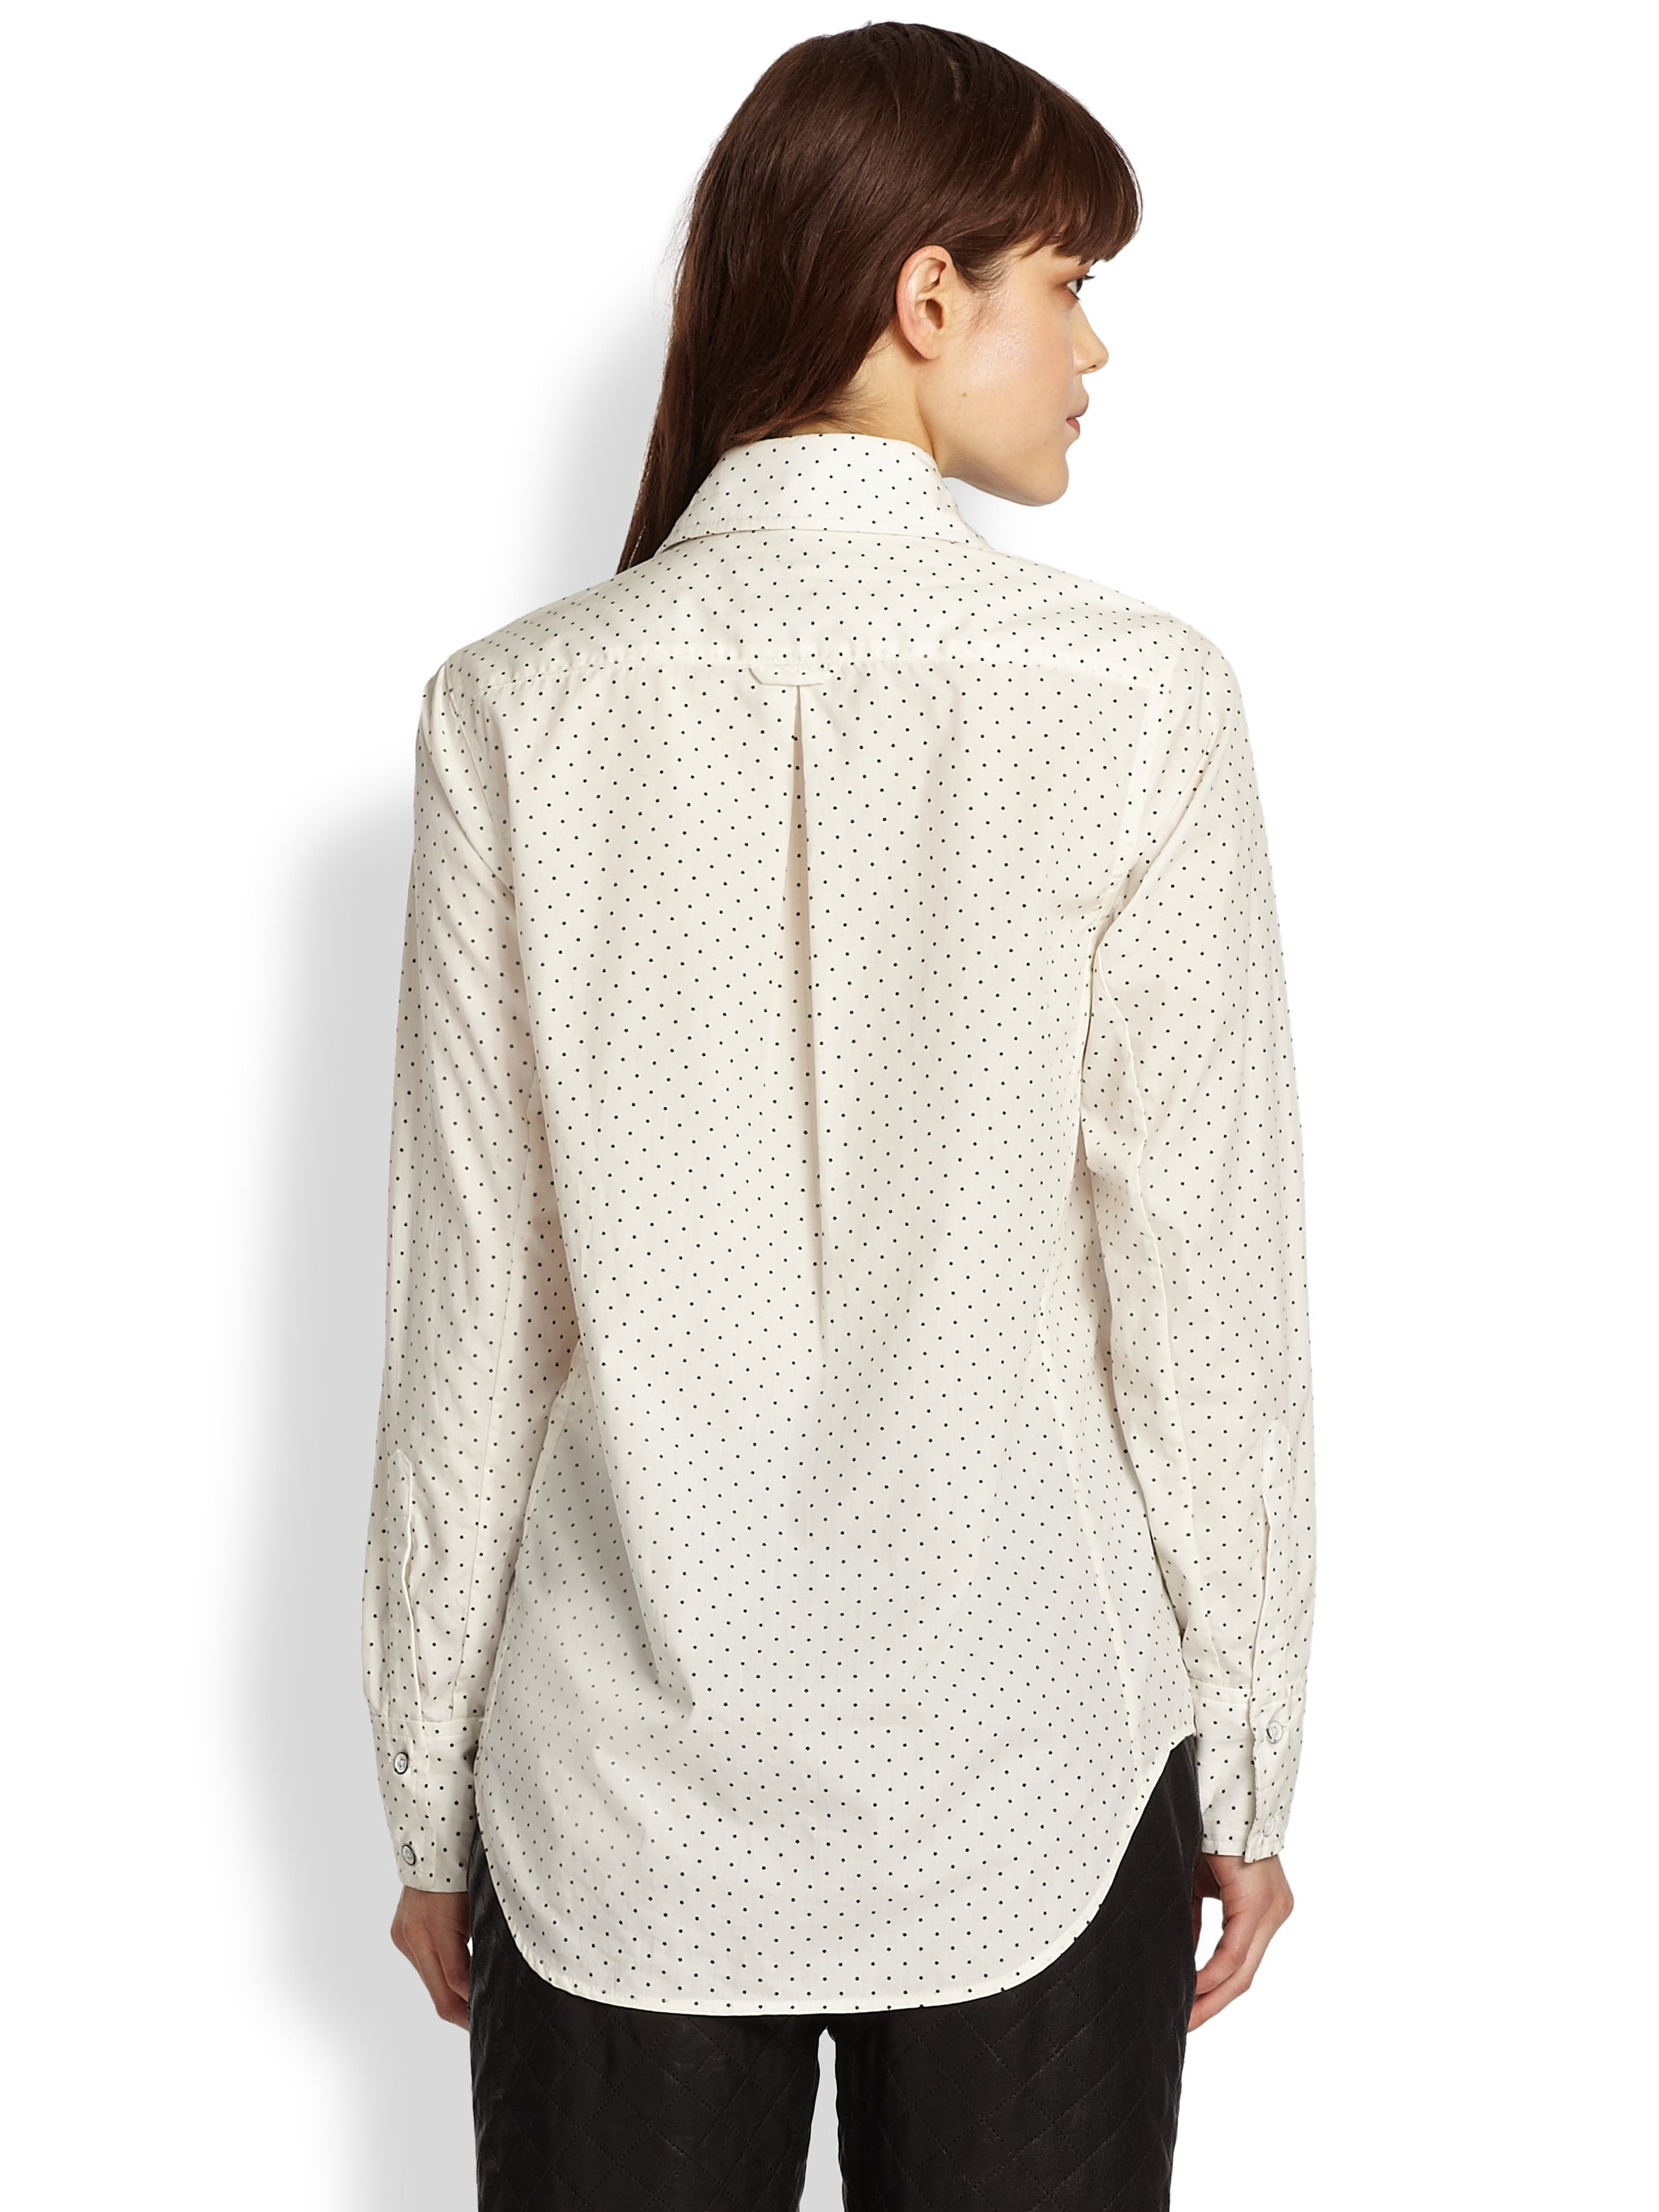 203241c9 Lyst - Rag & Bone Anaheim Polka Dot Cotton Shirt in White